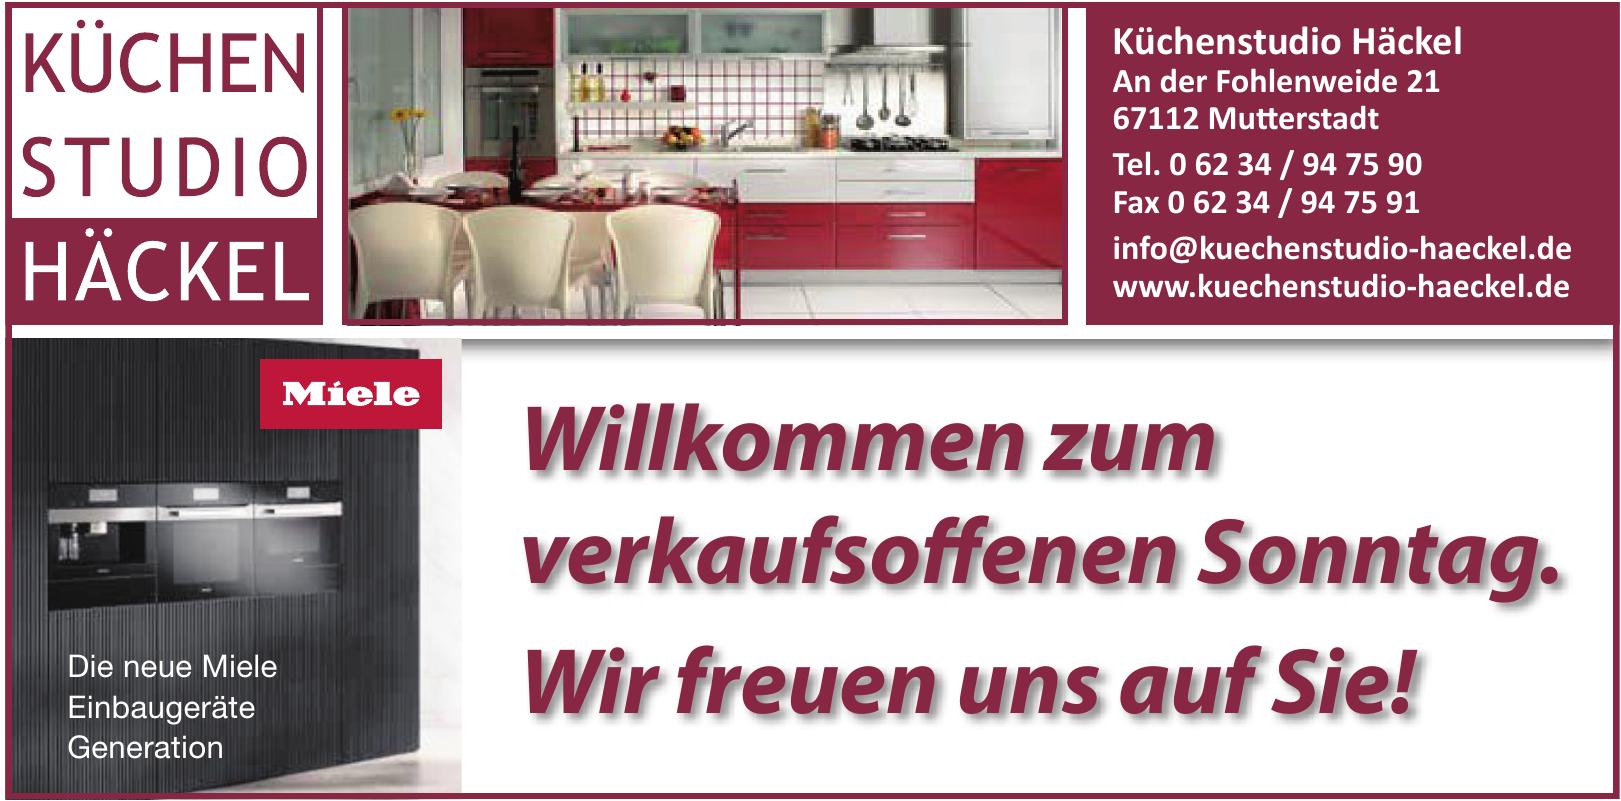 Küchen Studio Häckel